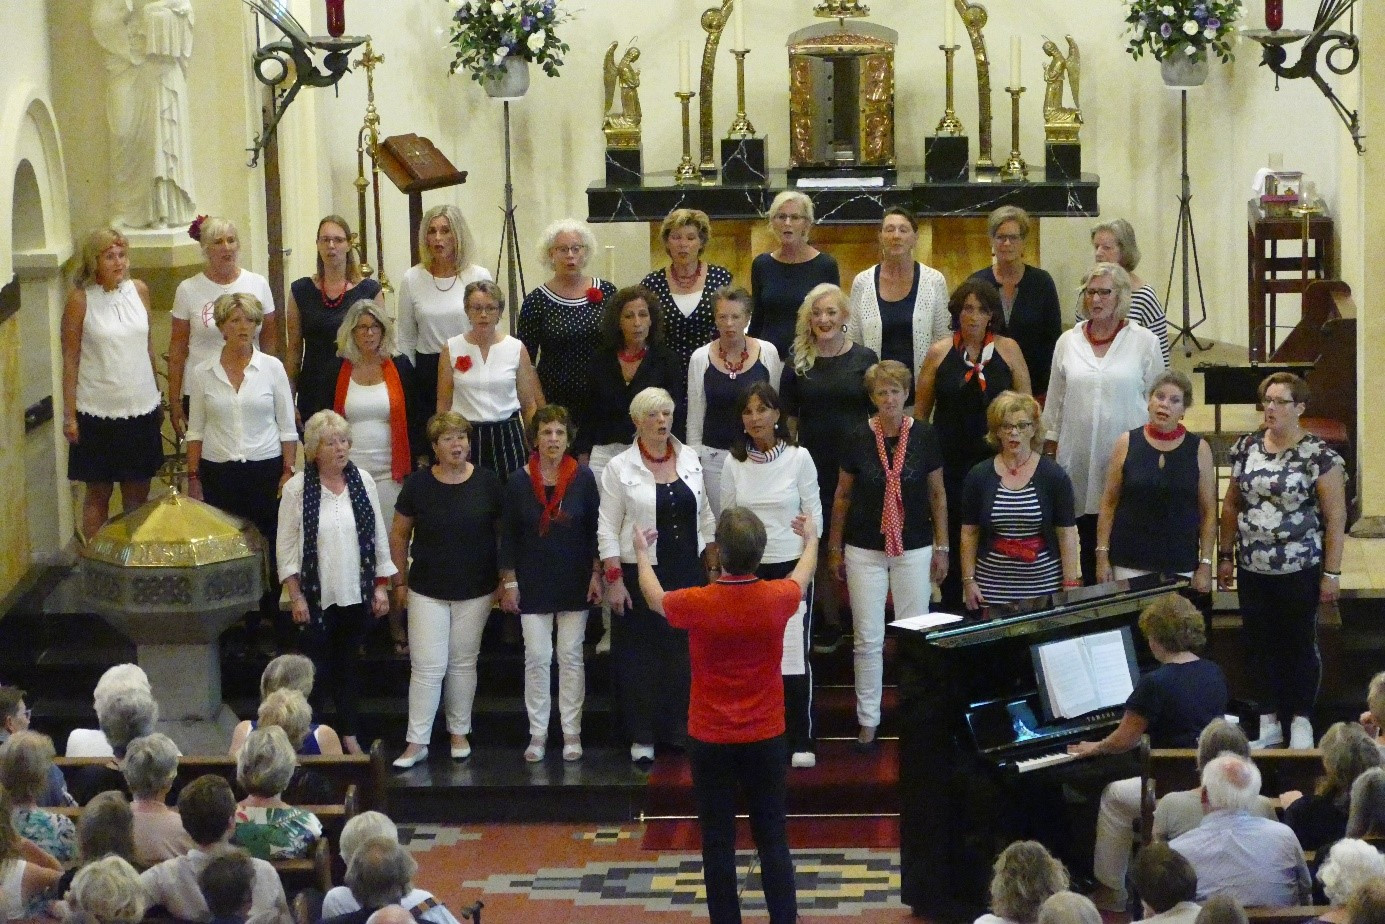 Espreszo Theaterchoir sings 'Battle for Freedom' for Sytske Foundation, proceeds: € 1.000!